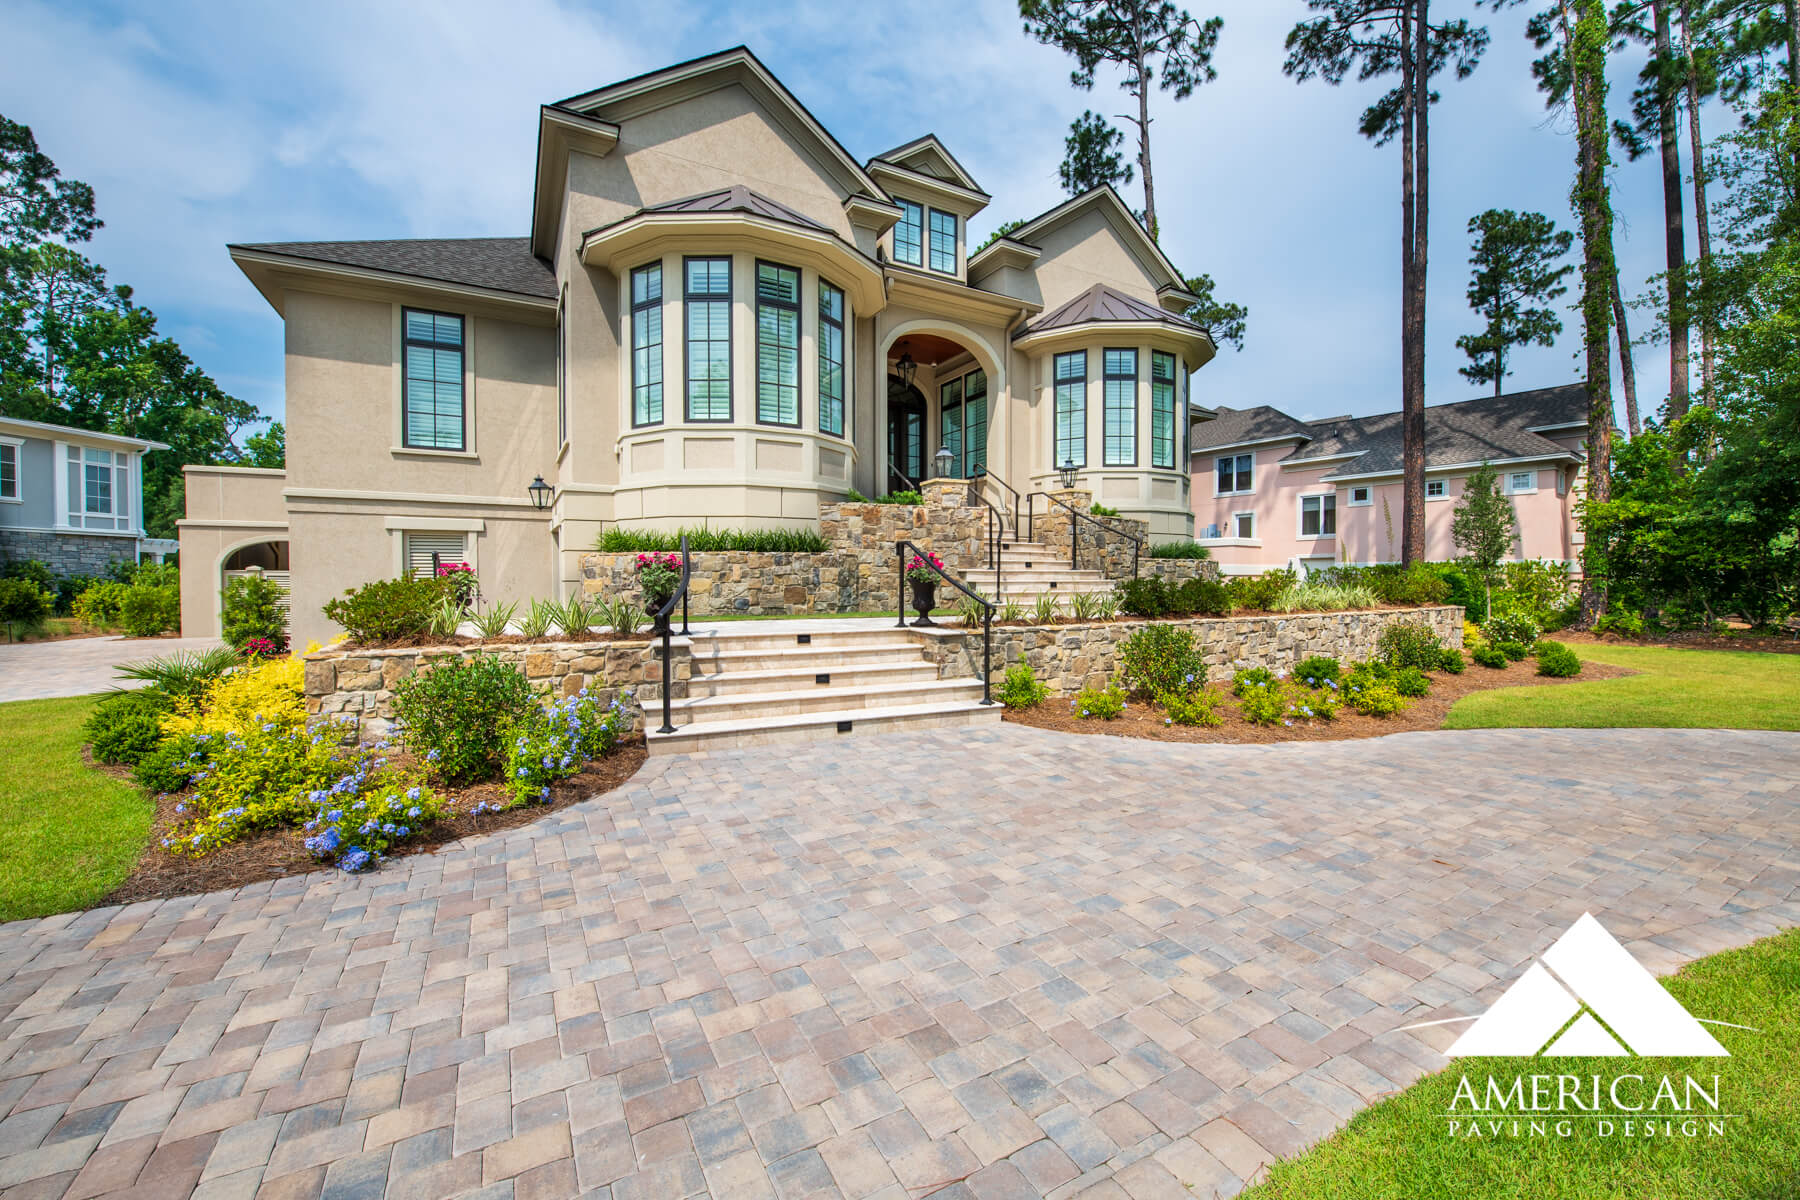 Paver Driveway Contractors - Hilton Head Island, South Carolina